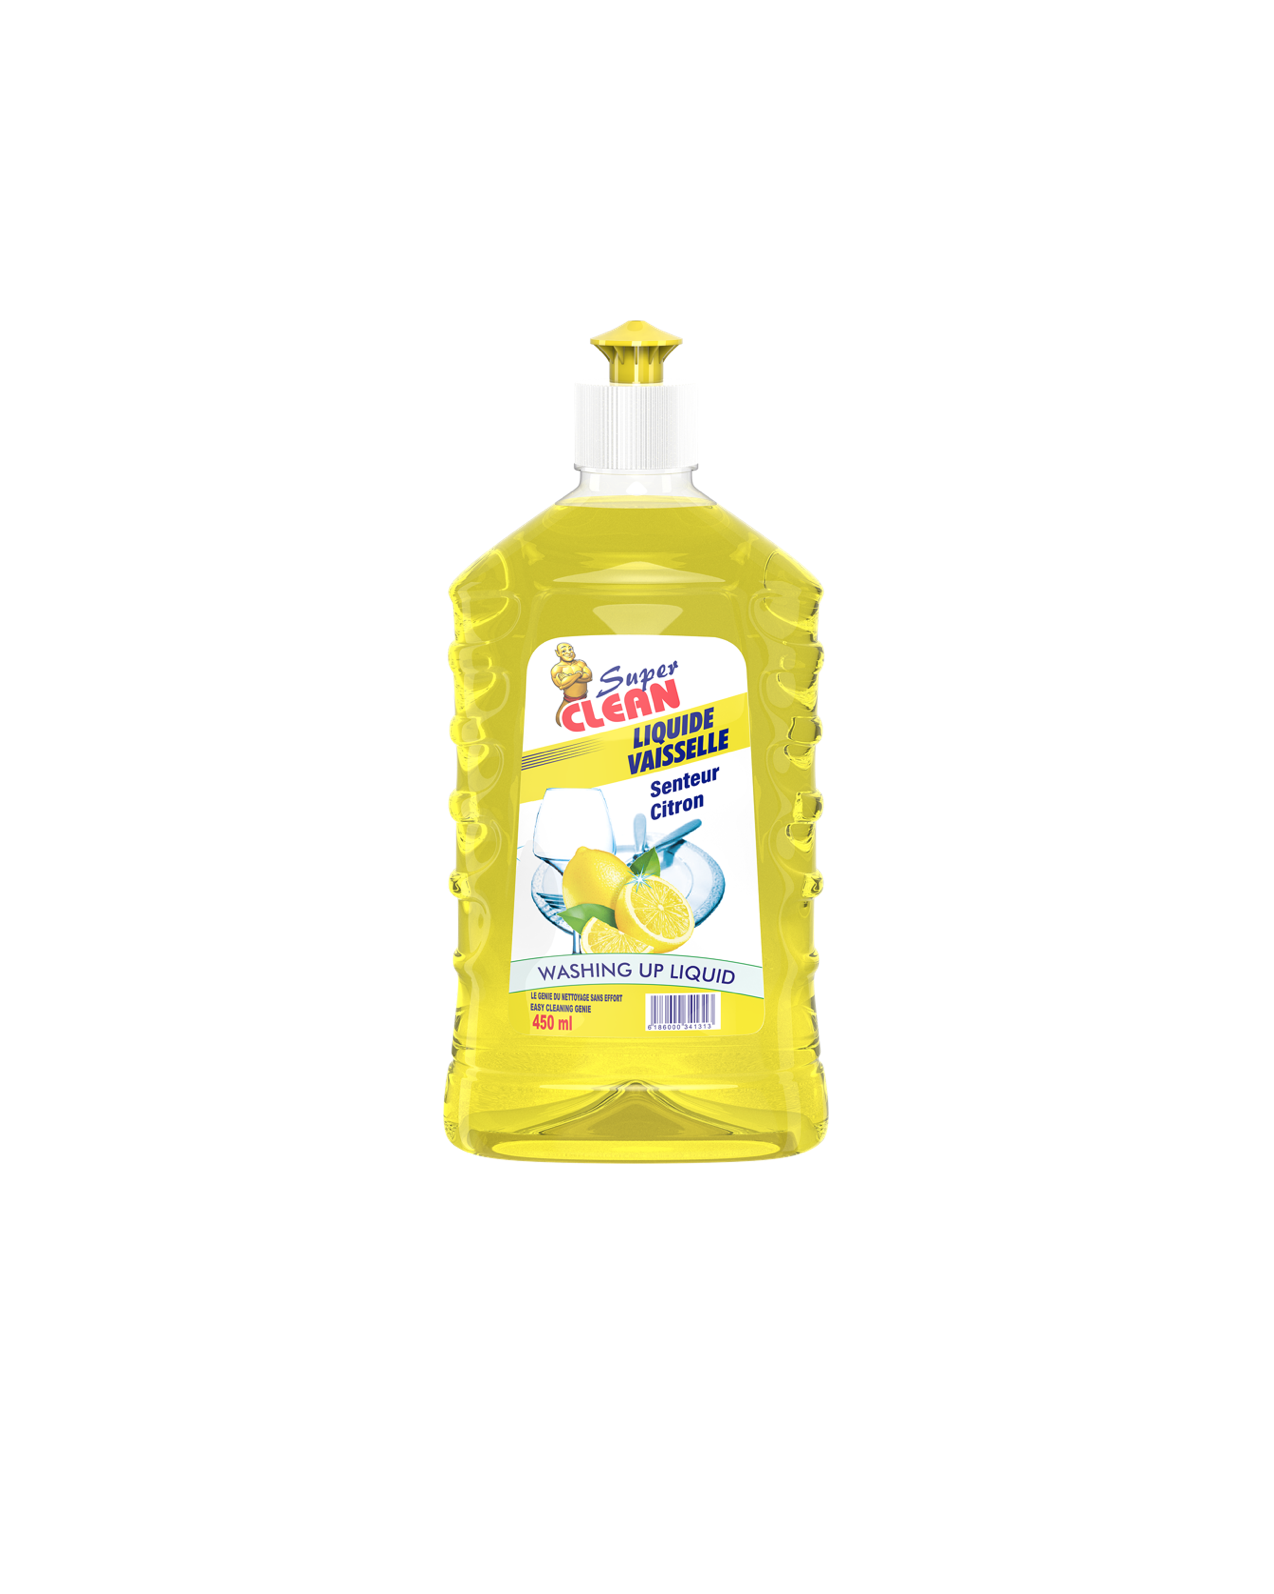 SUPER CLEAN_Liquide Vaisselle Citron 450ml_siprochim